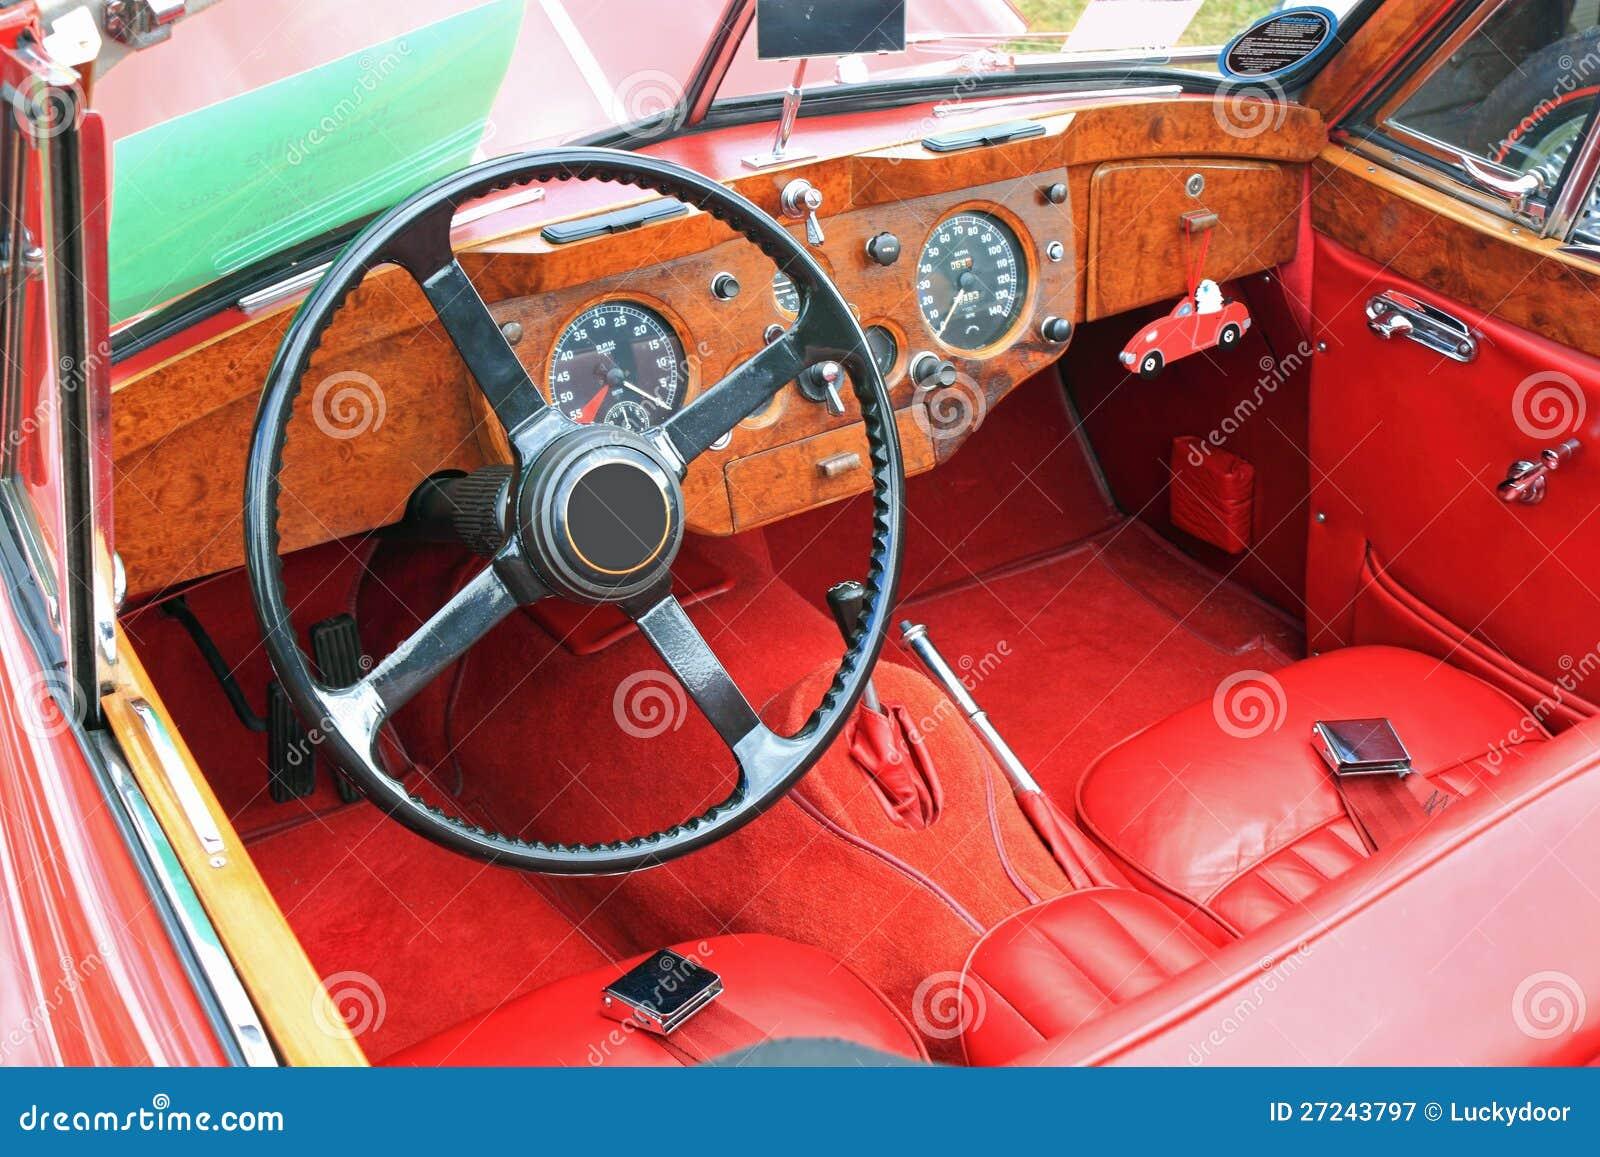 Antikes auto innenraum ansicht lizenzfreie stockfotografie for Auto innenraum